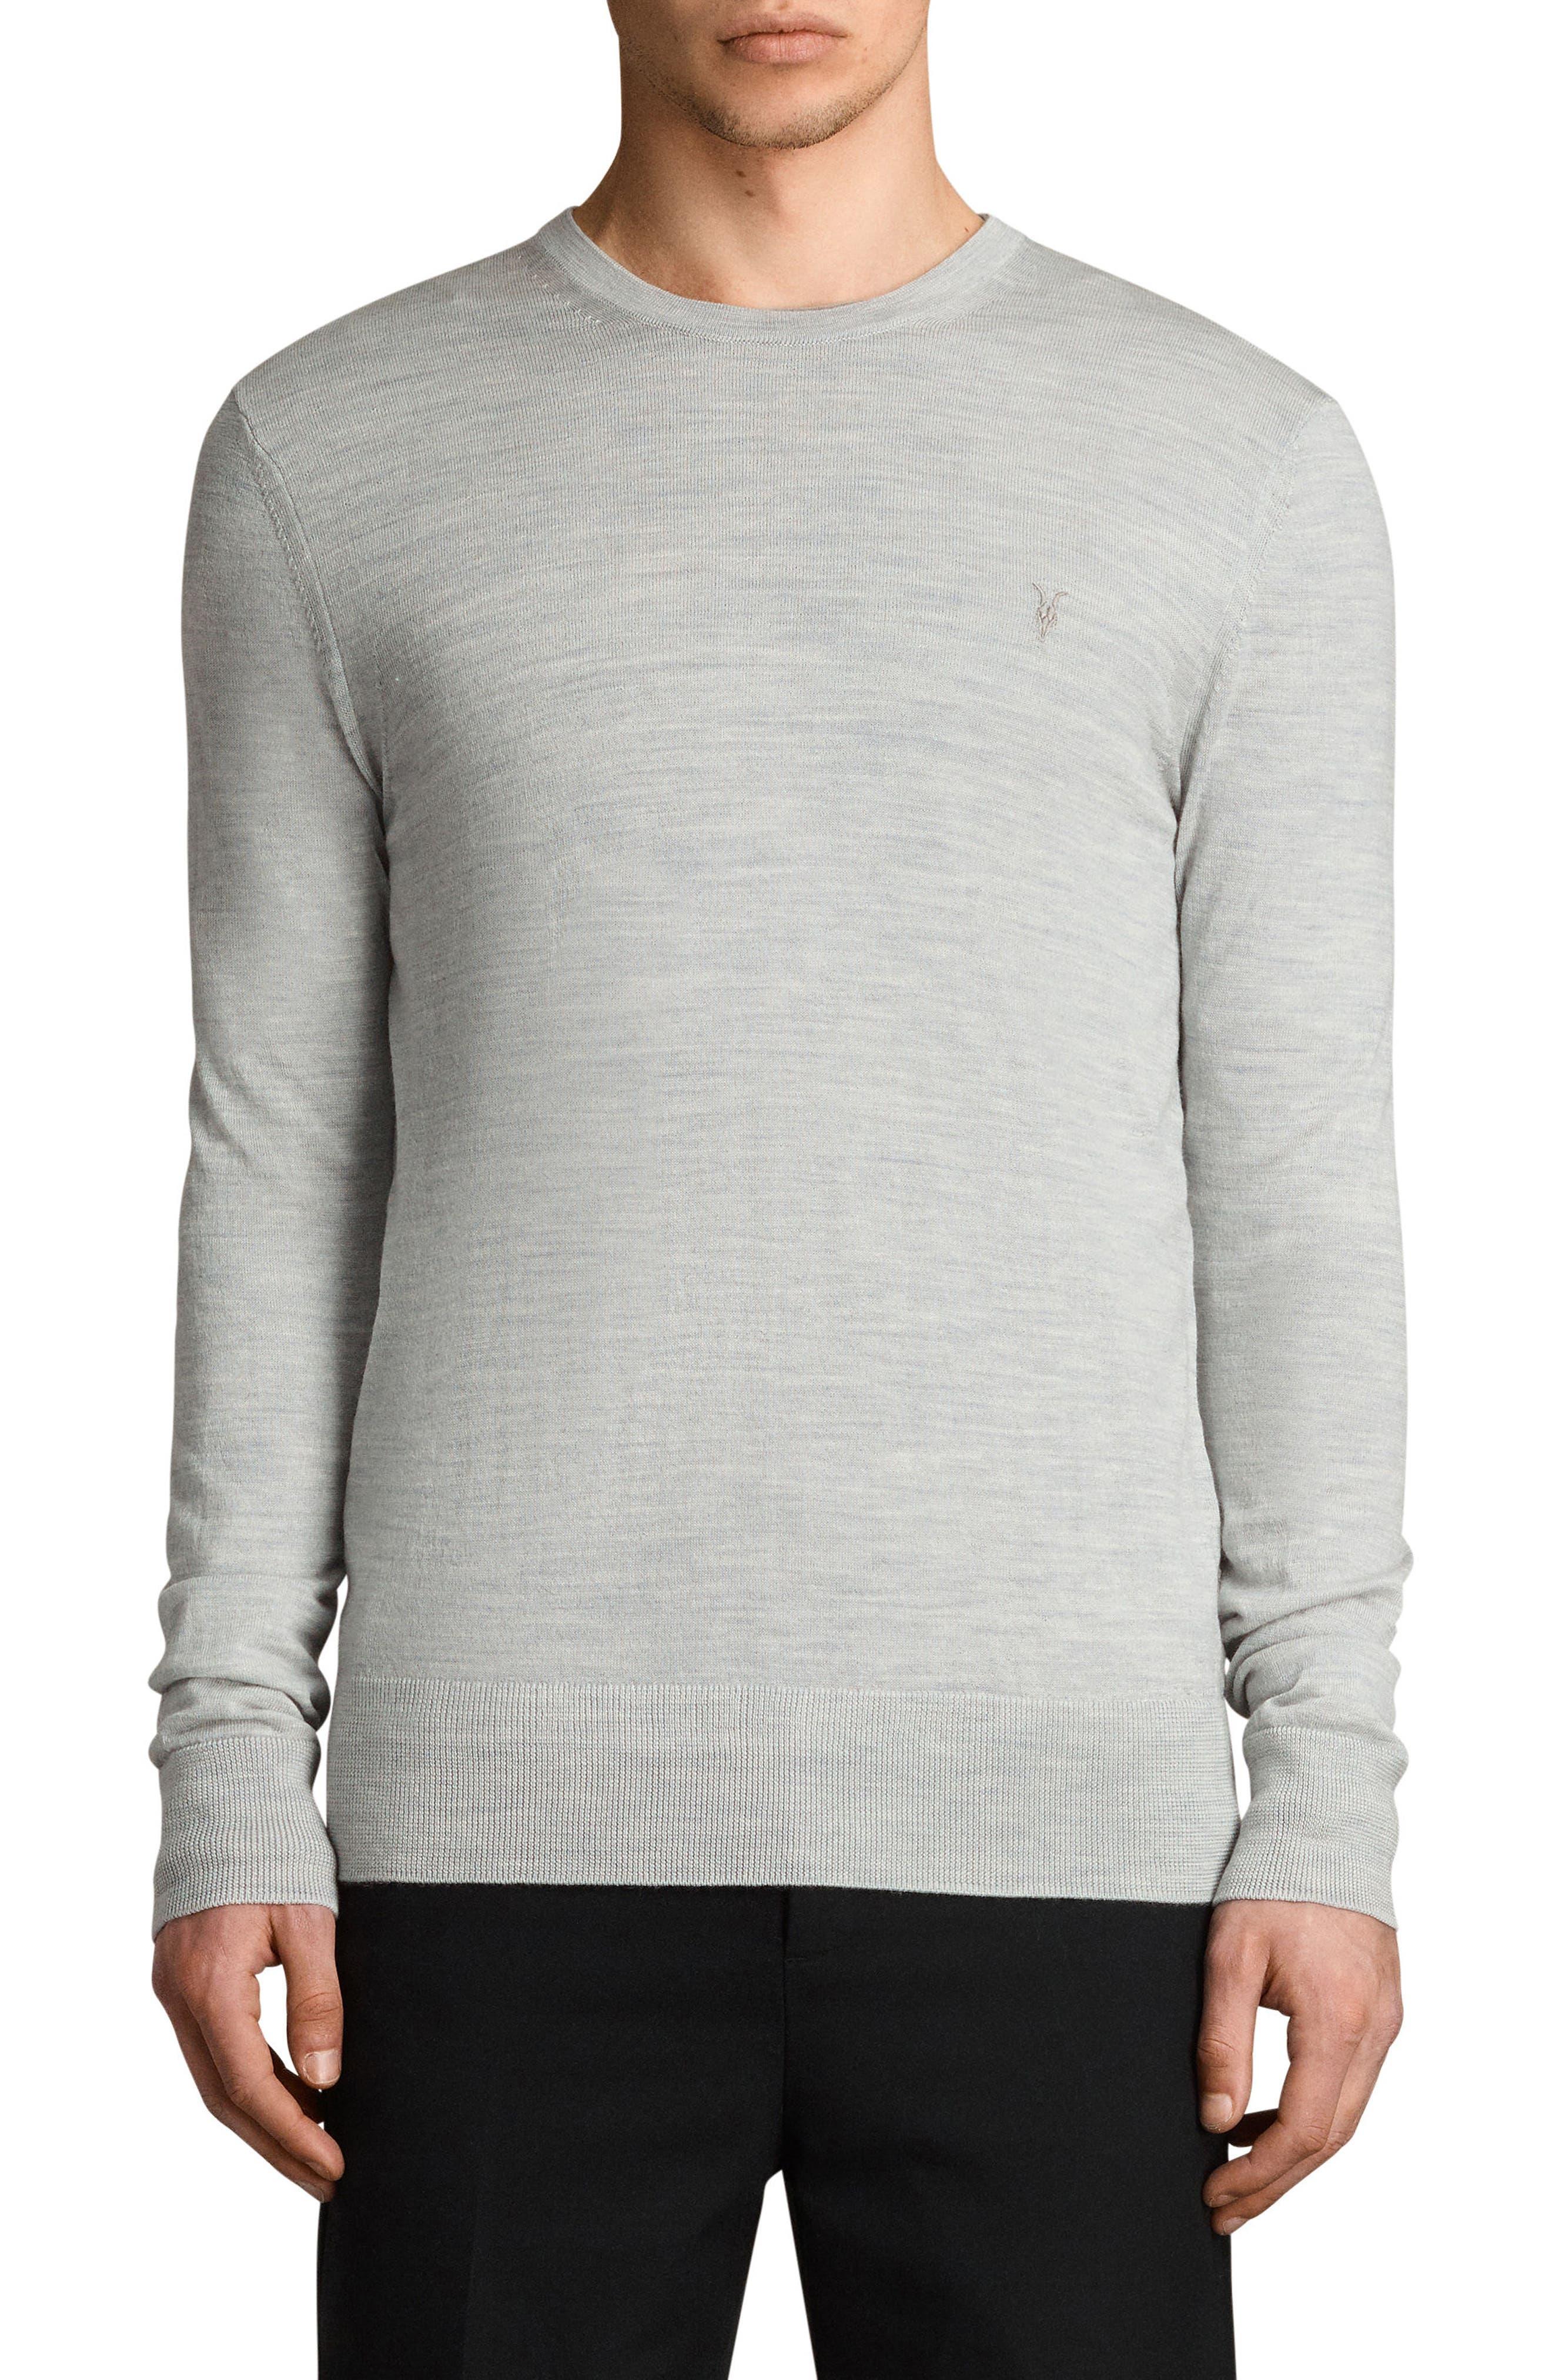 Mode Slim Fit Merino Wool Sweater,                         Main,                         color, Light Grey Marl